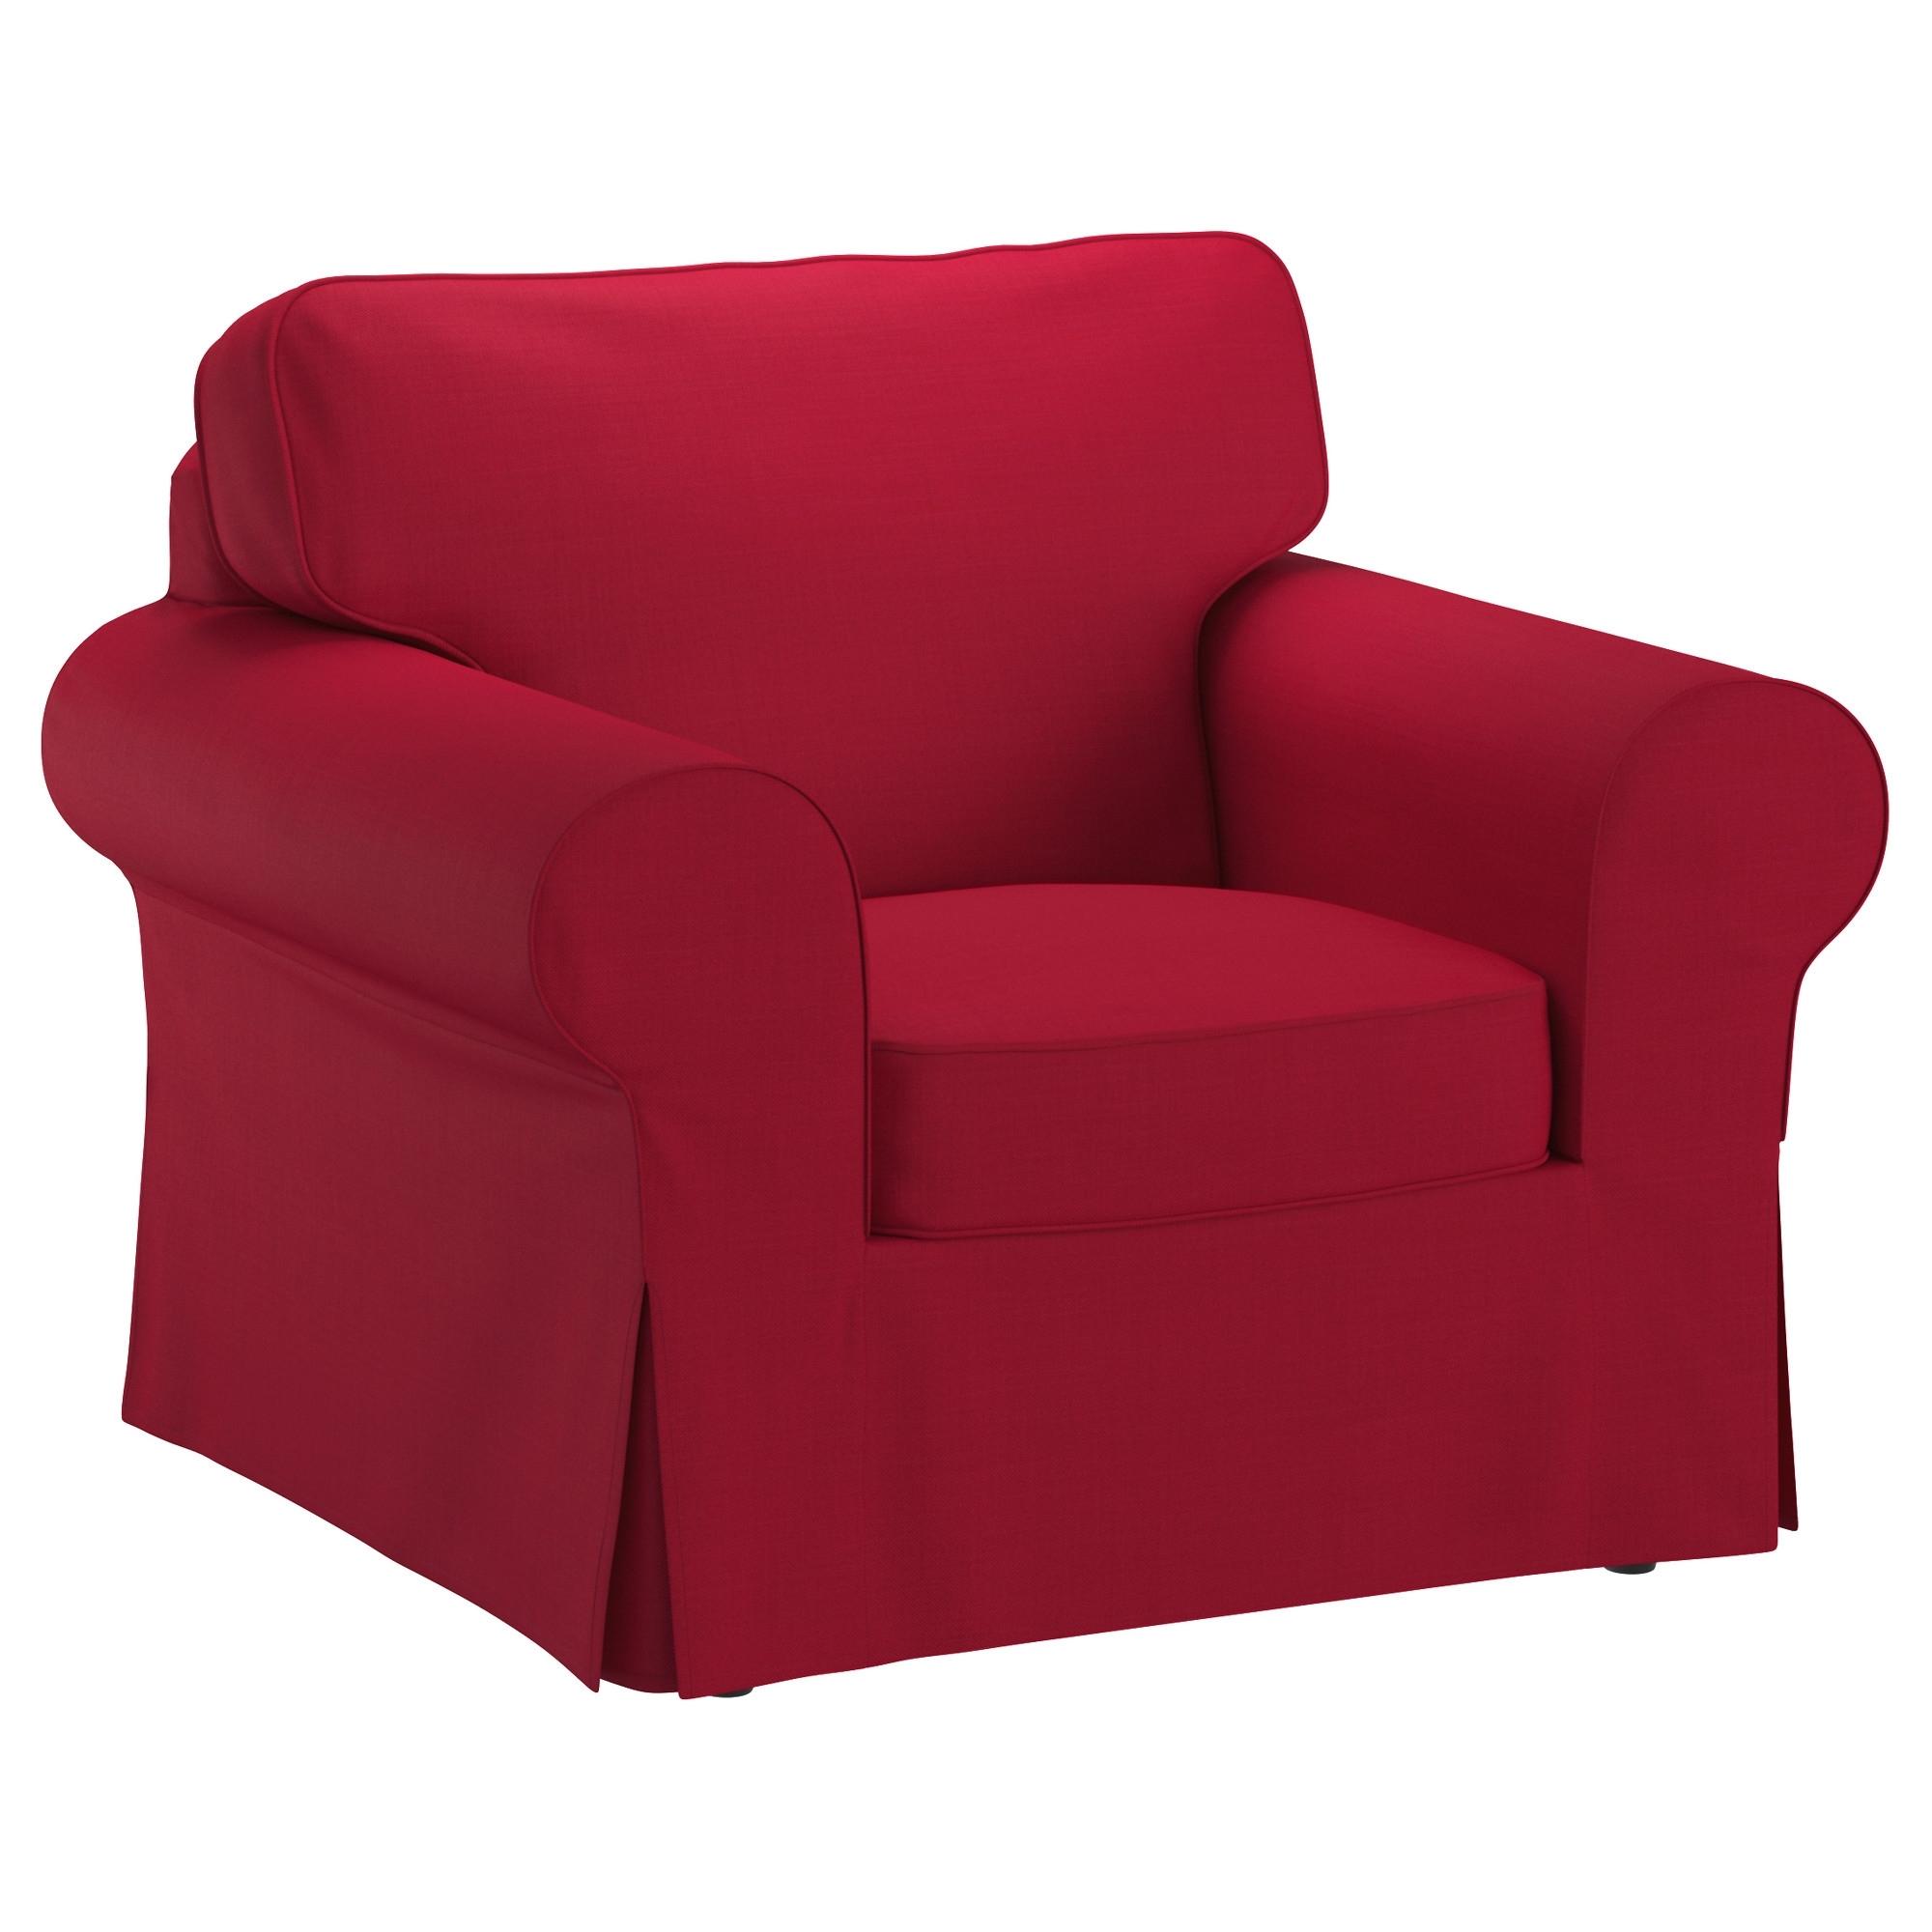 Most Recent Red Sofa Chairs Regarding Ektorp Armchair – Nordvalla Dark Gray – Ikea (View 6 of 15)